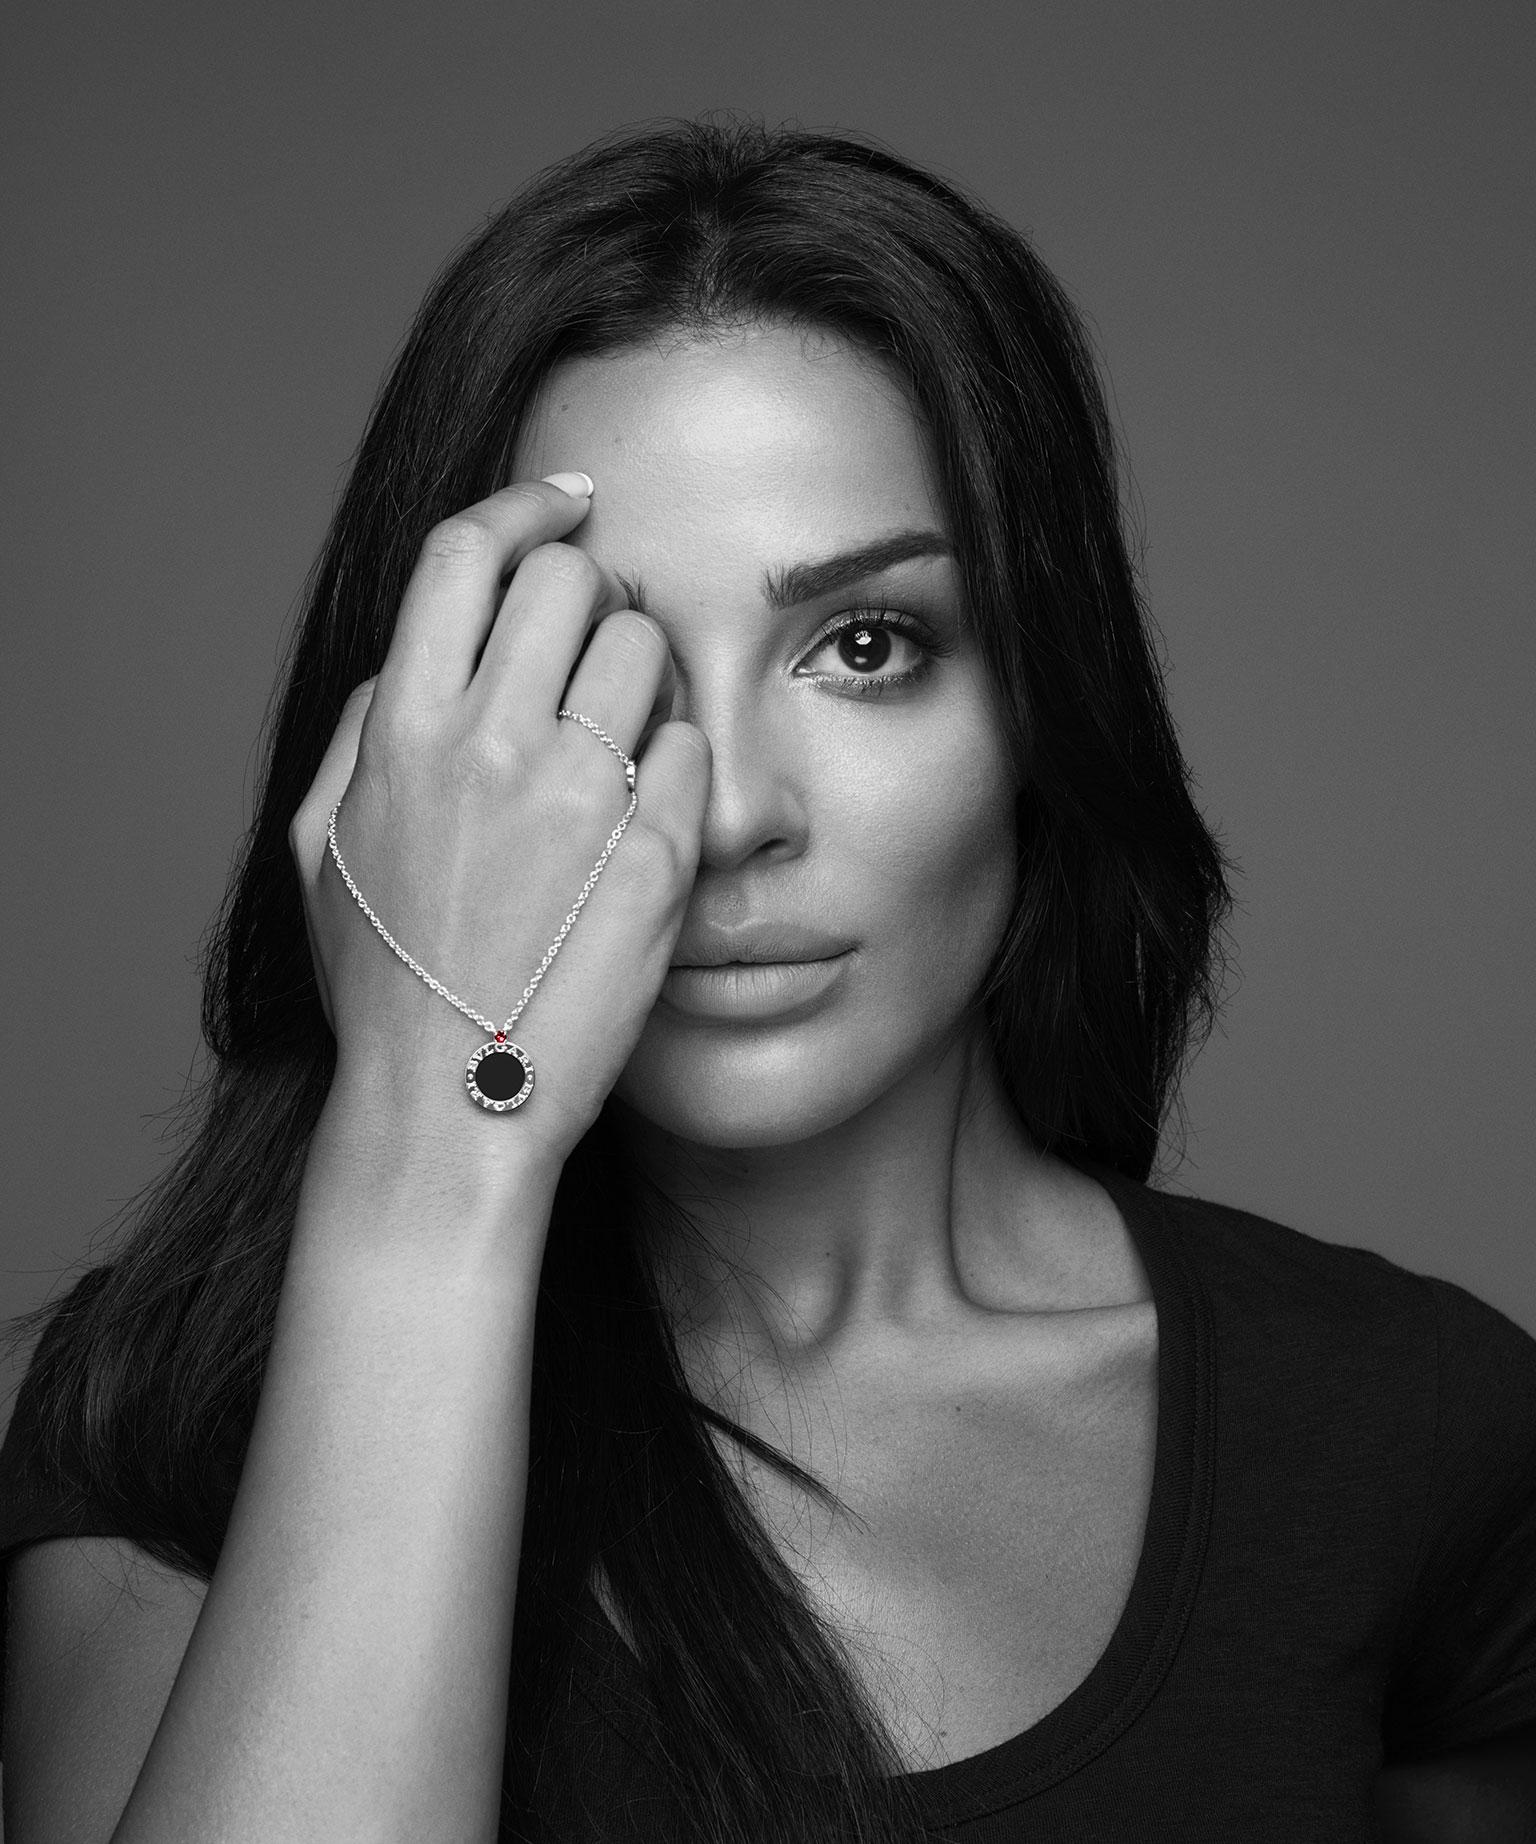 Bvlgari-Save-The-Children-Give-Hope-Nadine-Nassib-Njeim-01.jpg